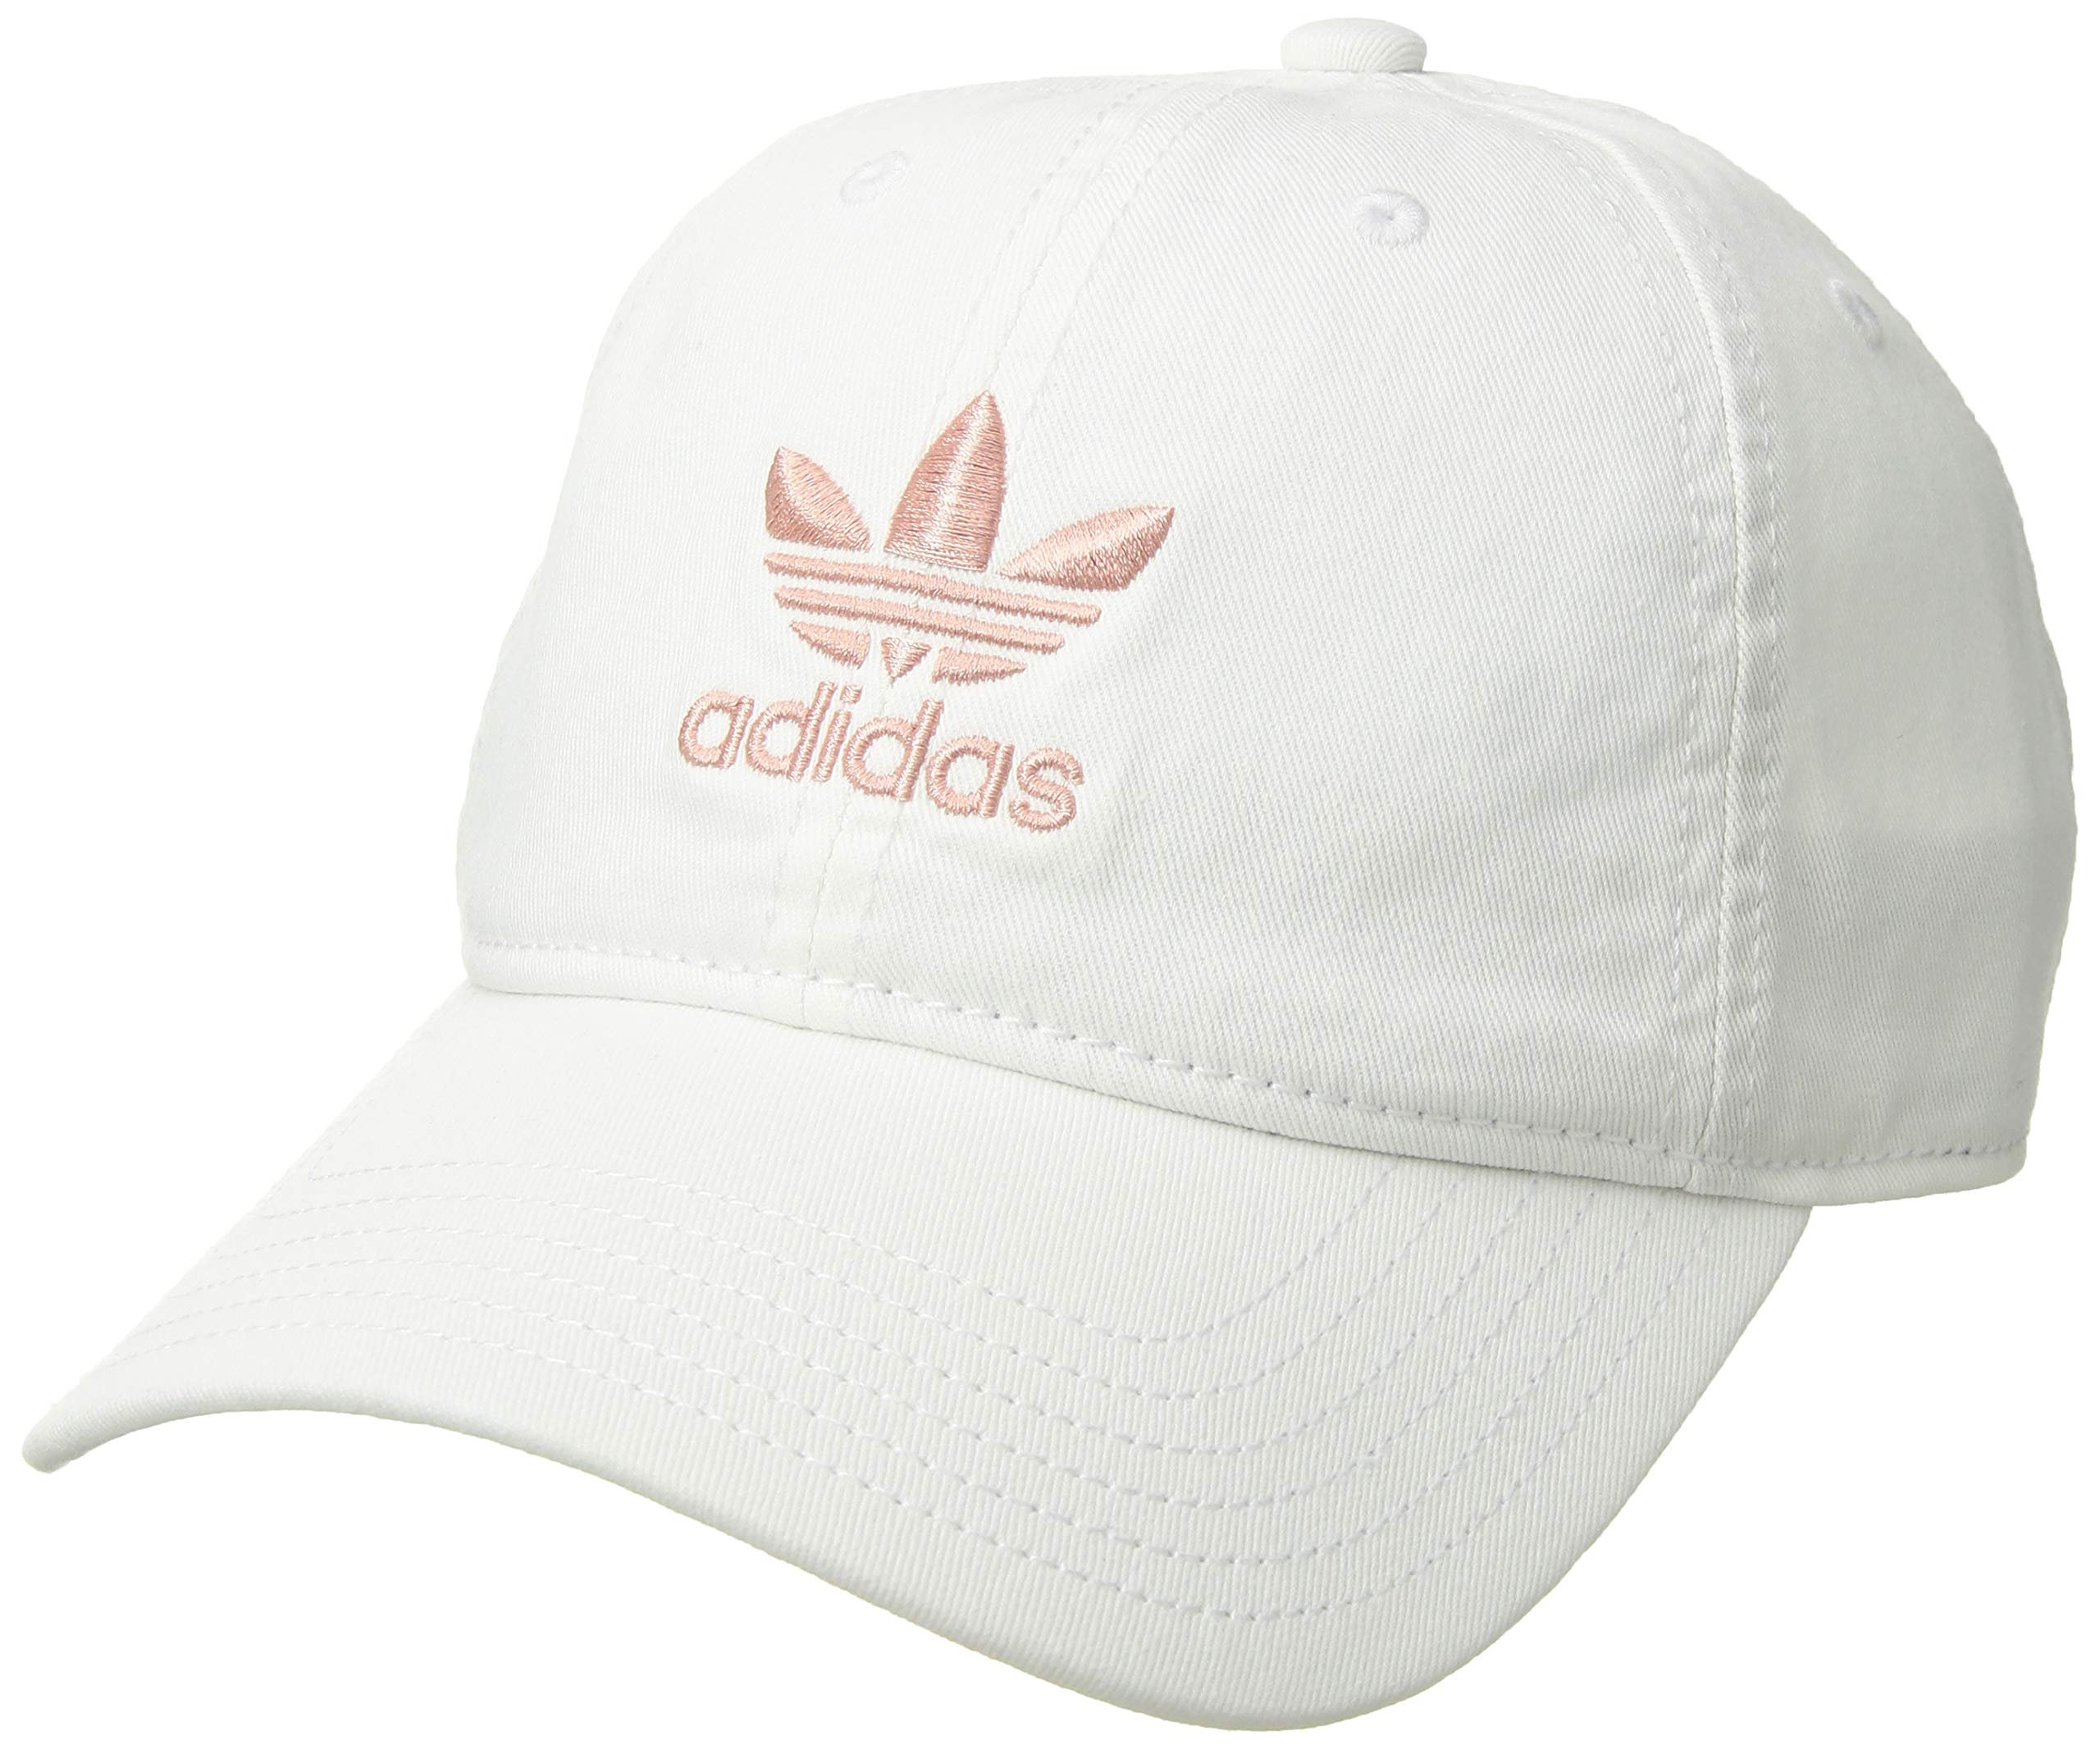 Galleon - Adidas Women s Originals Relaxed Adjustable Strapback Cap ... 816e8eccf924